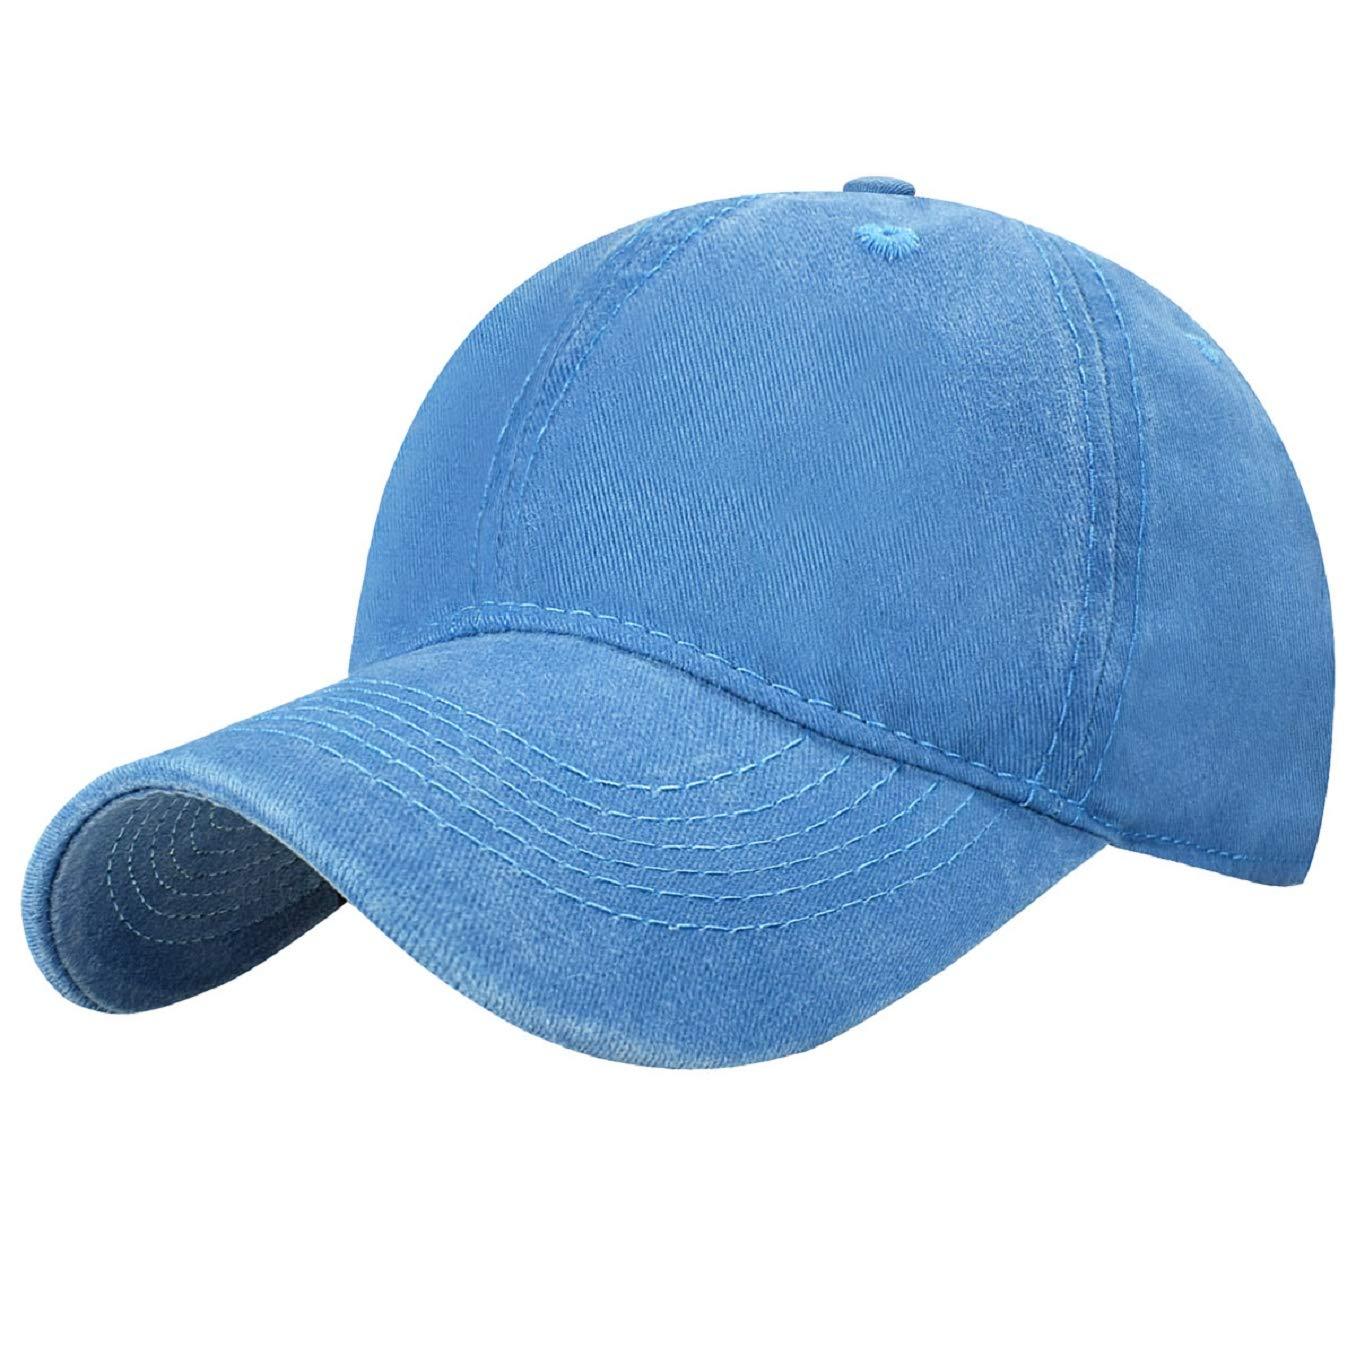 4F Baseballcap Damen Einstellbar Basecap Kappe Sommer Baseballmütze Sport Mütze